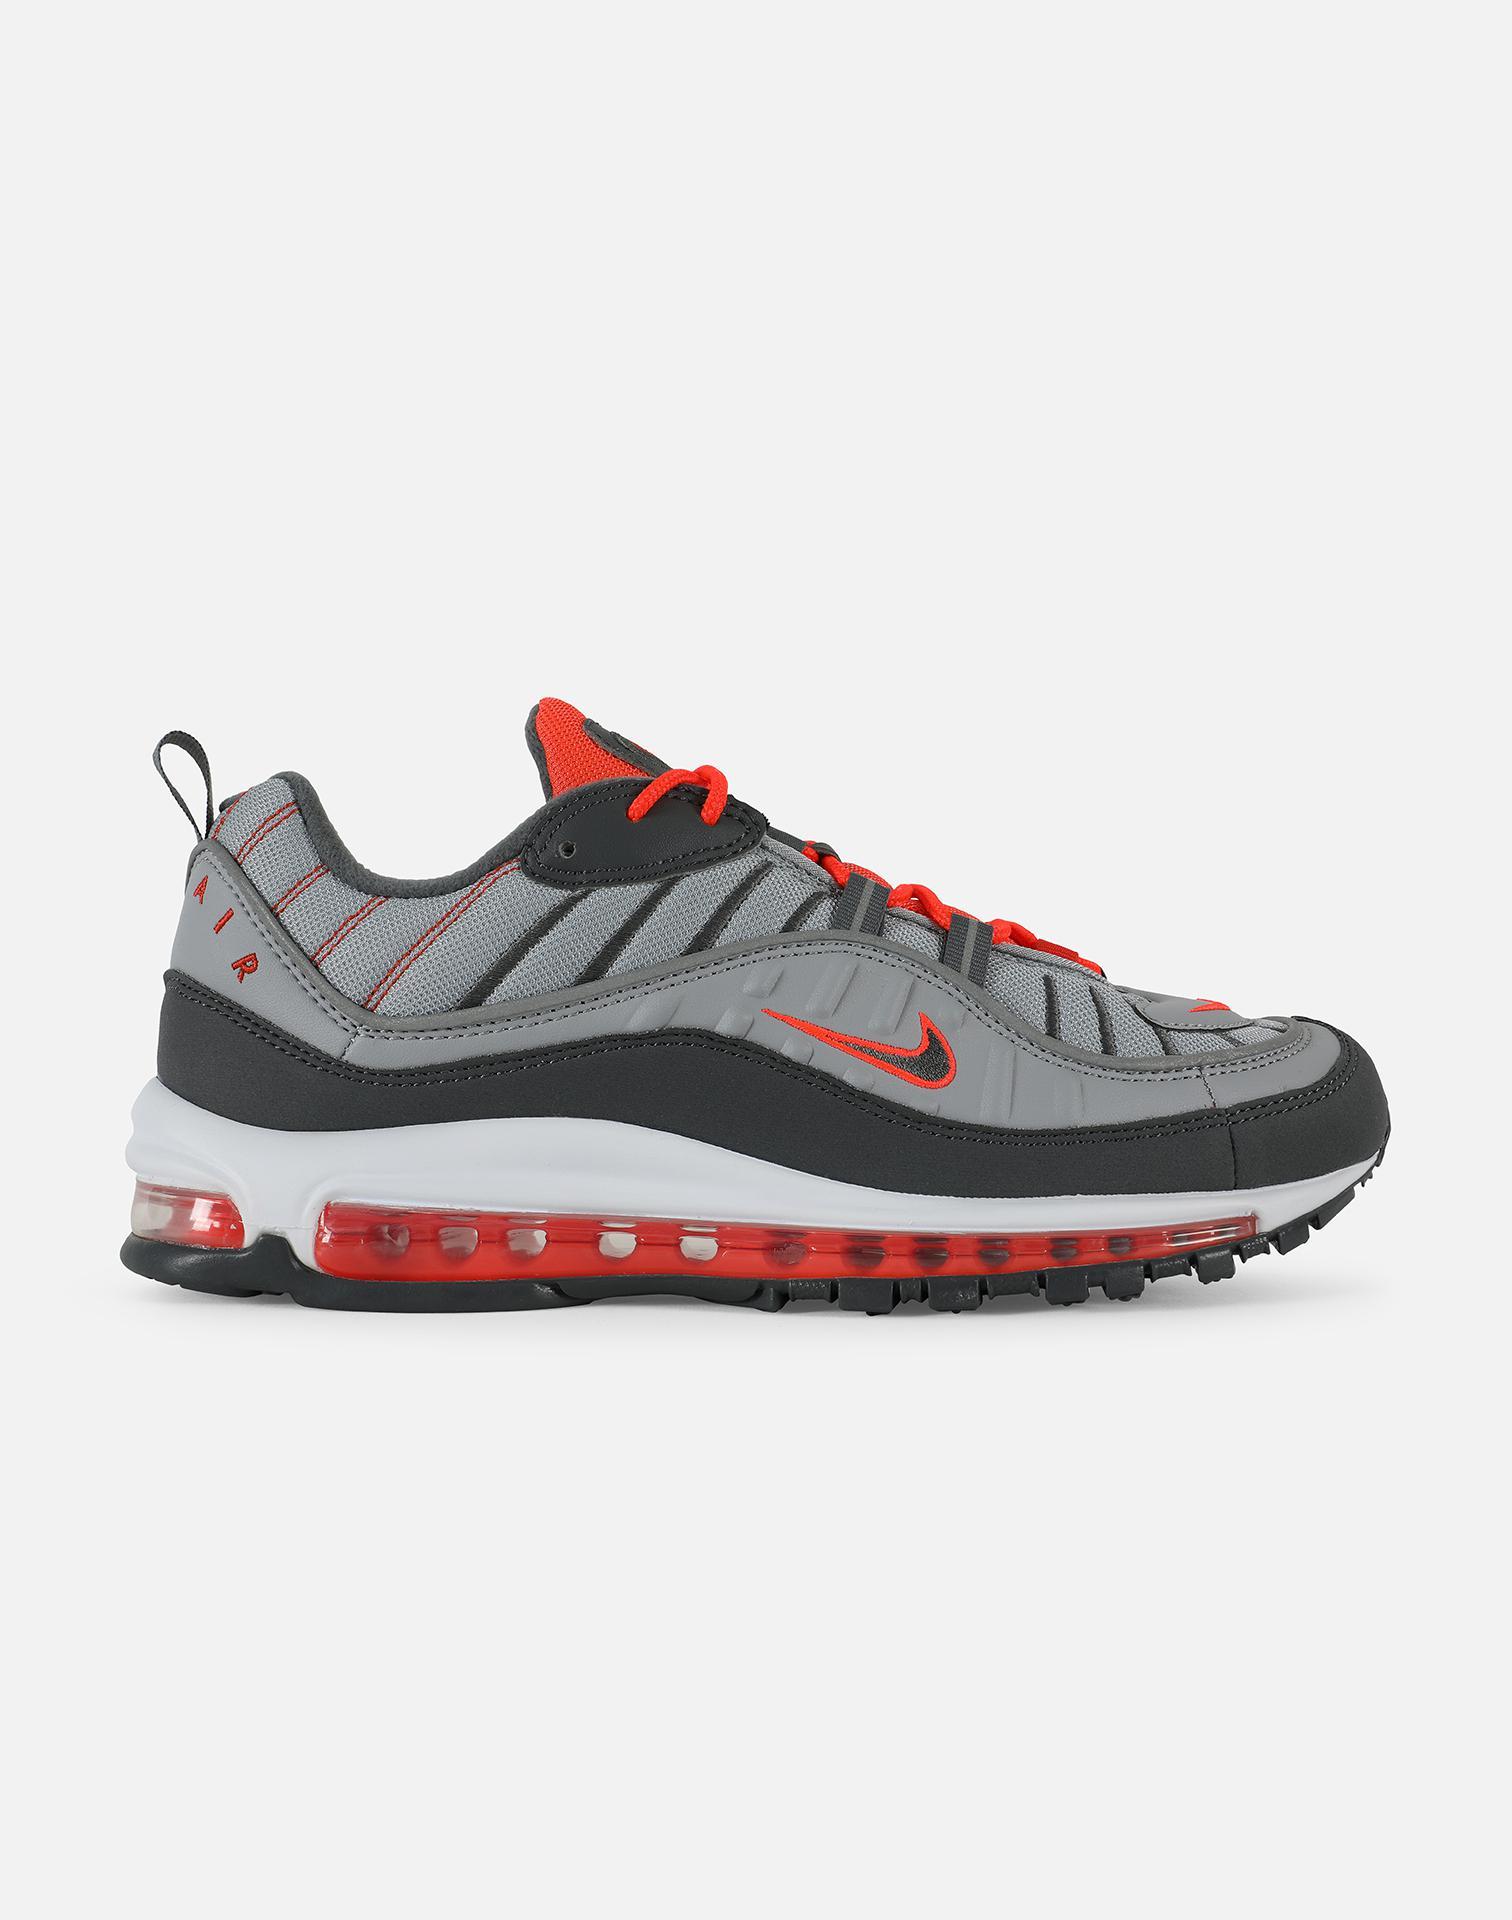 7e1c589ba59fe Lyst - Nike Air Max 98 in Gray for Men